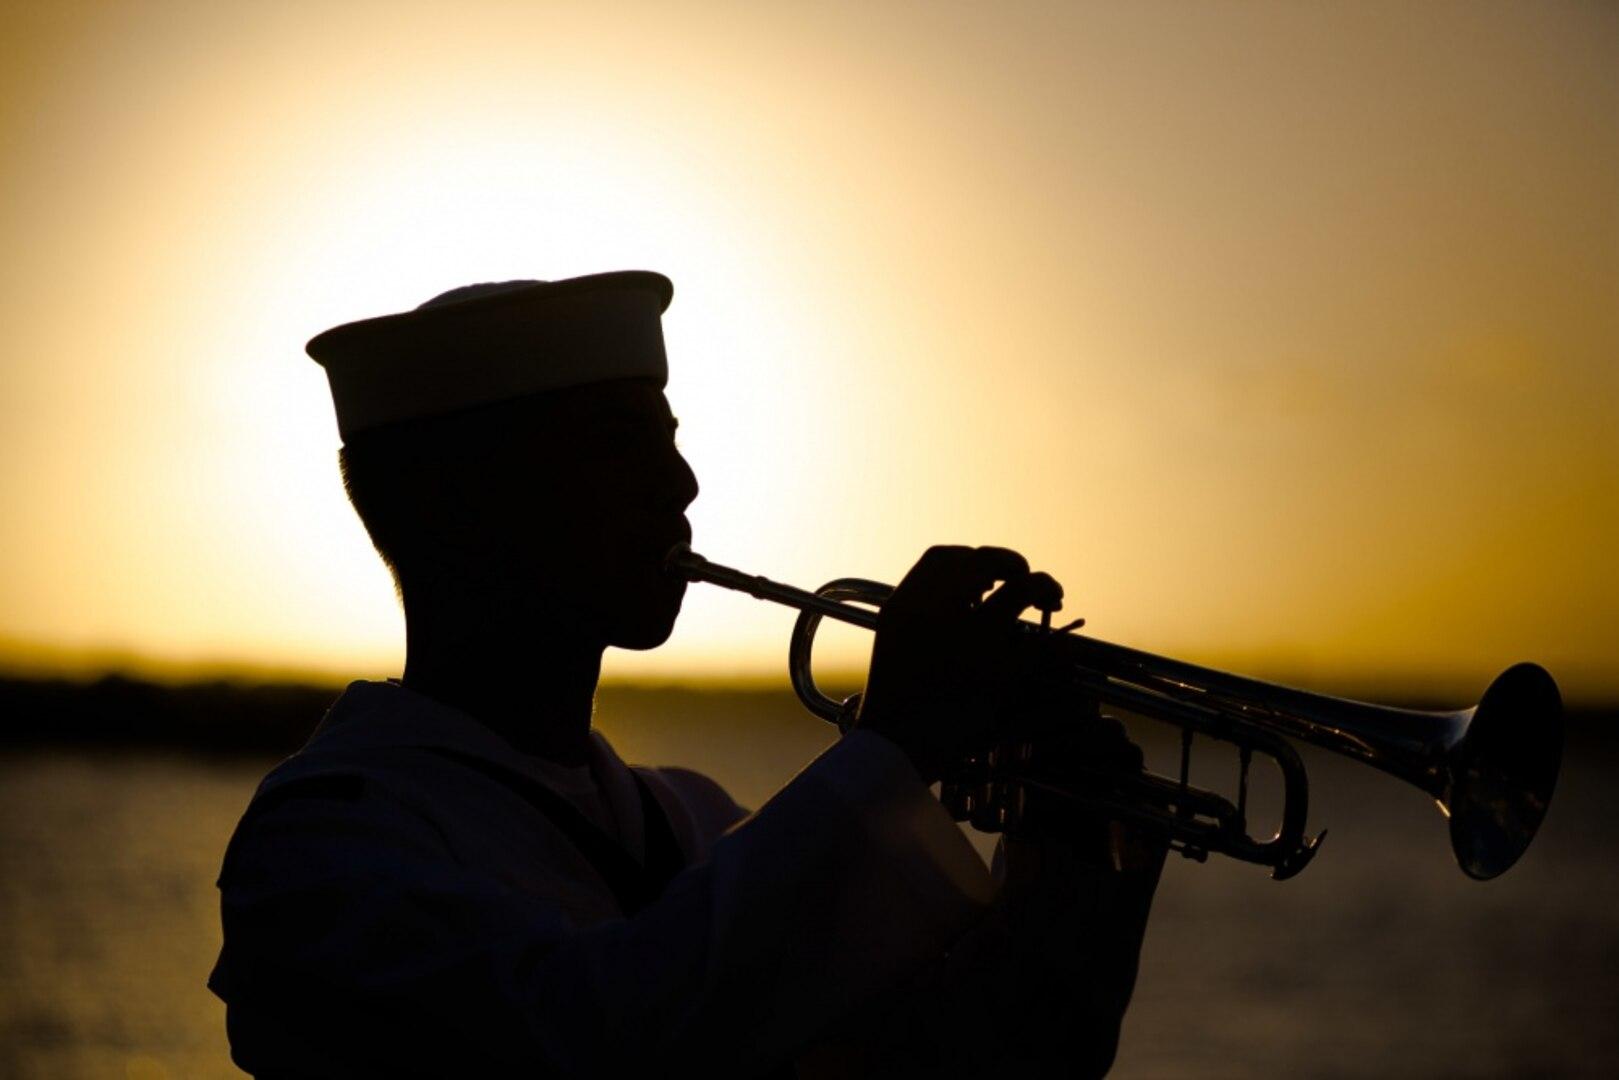 Joint Base Pearl Harbor-Hickam Celebrates 'Blackened Canteen' Ceremony